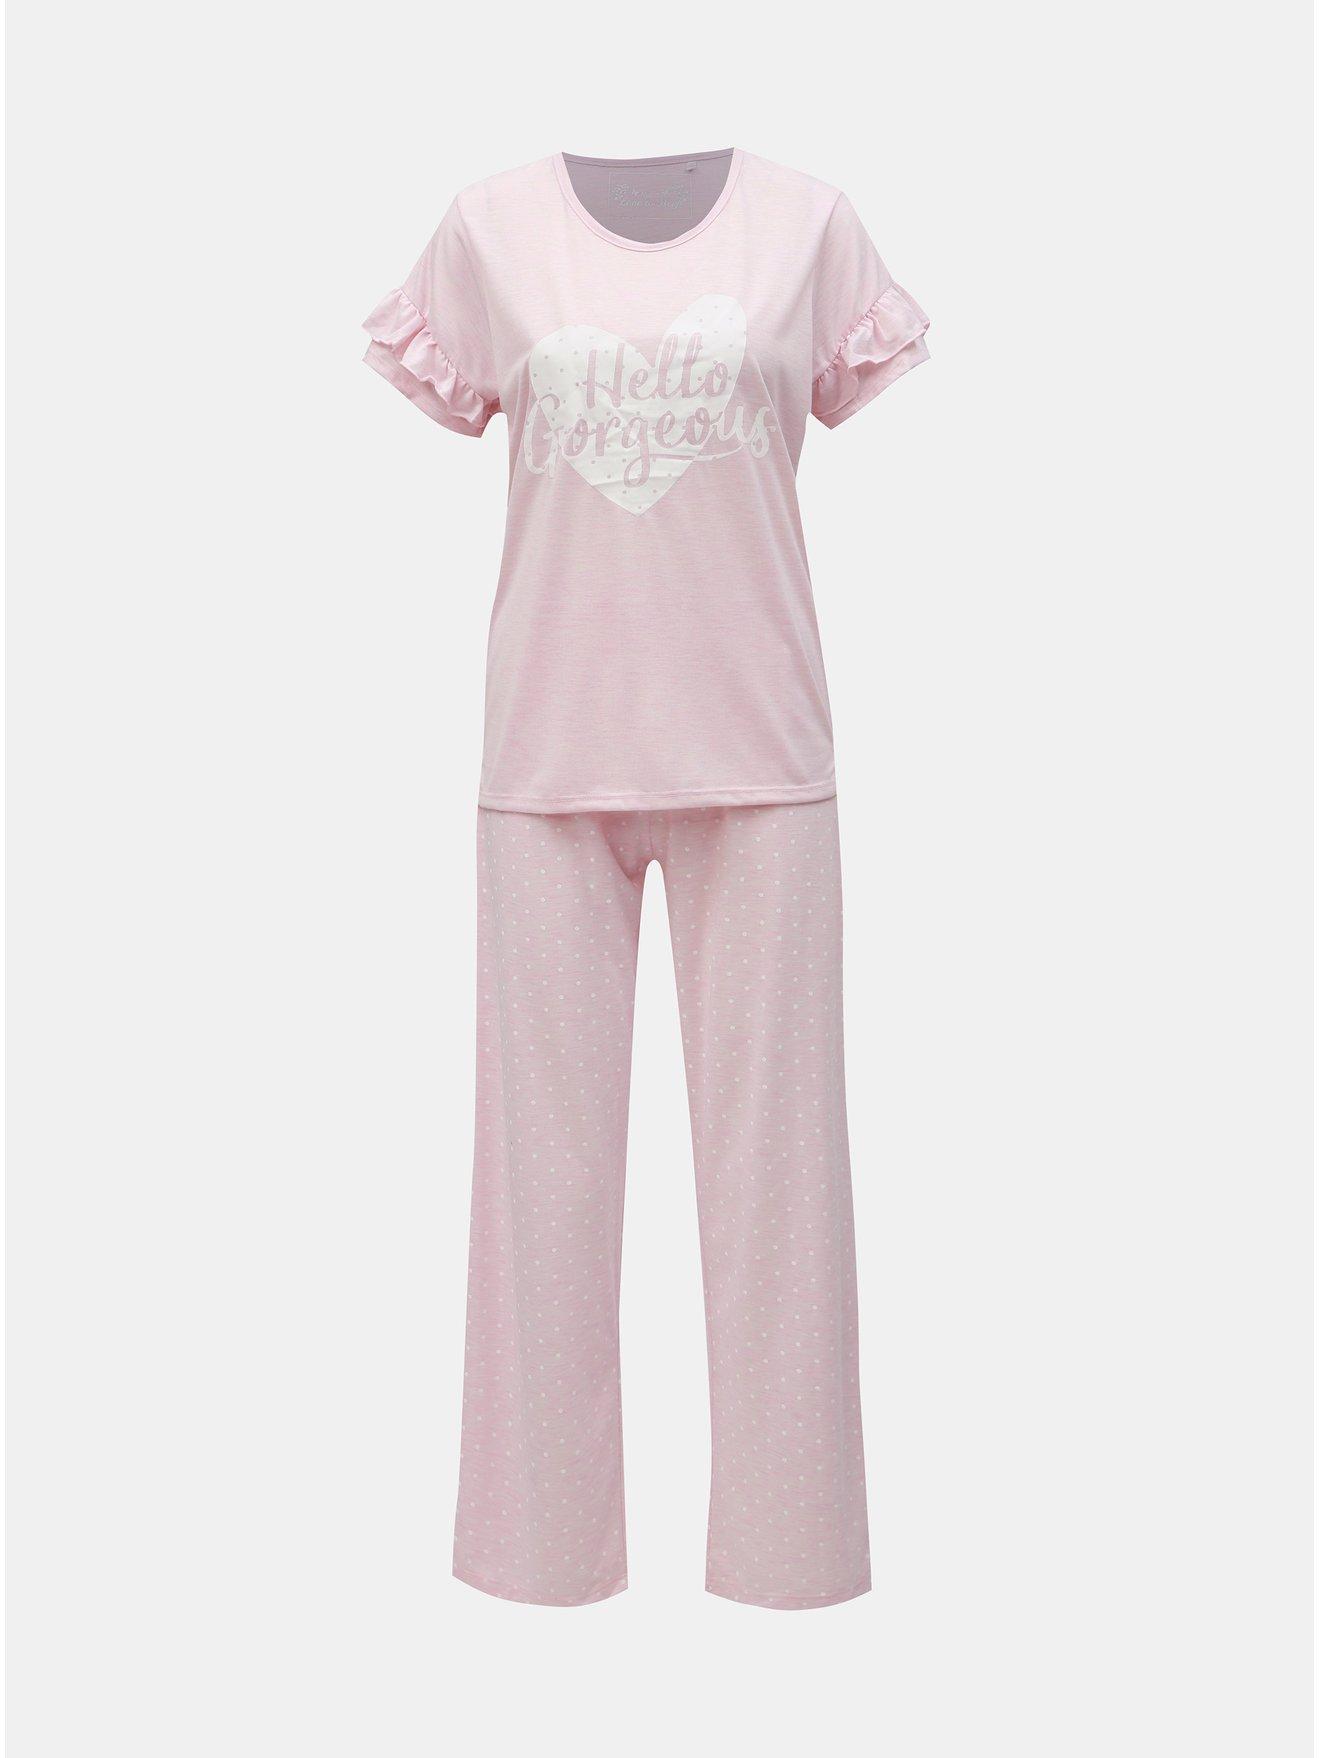 Fotografie Růžové žíhané dvoudílné pyžamo s potiskem M&Co